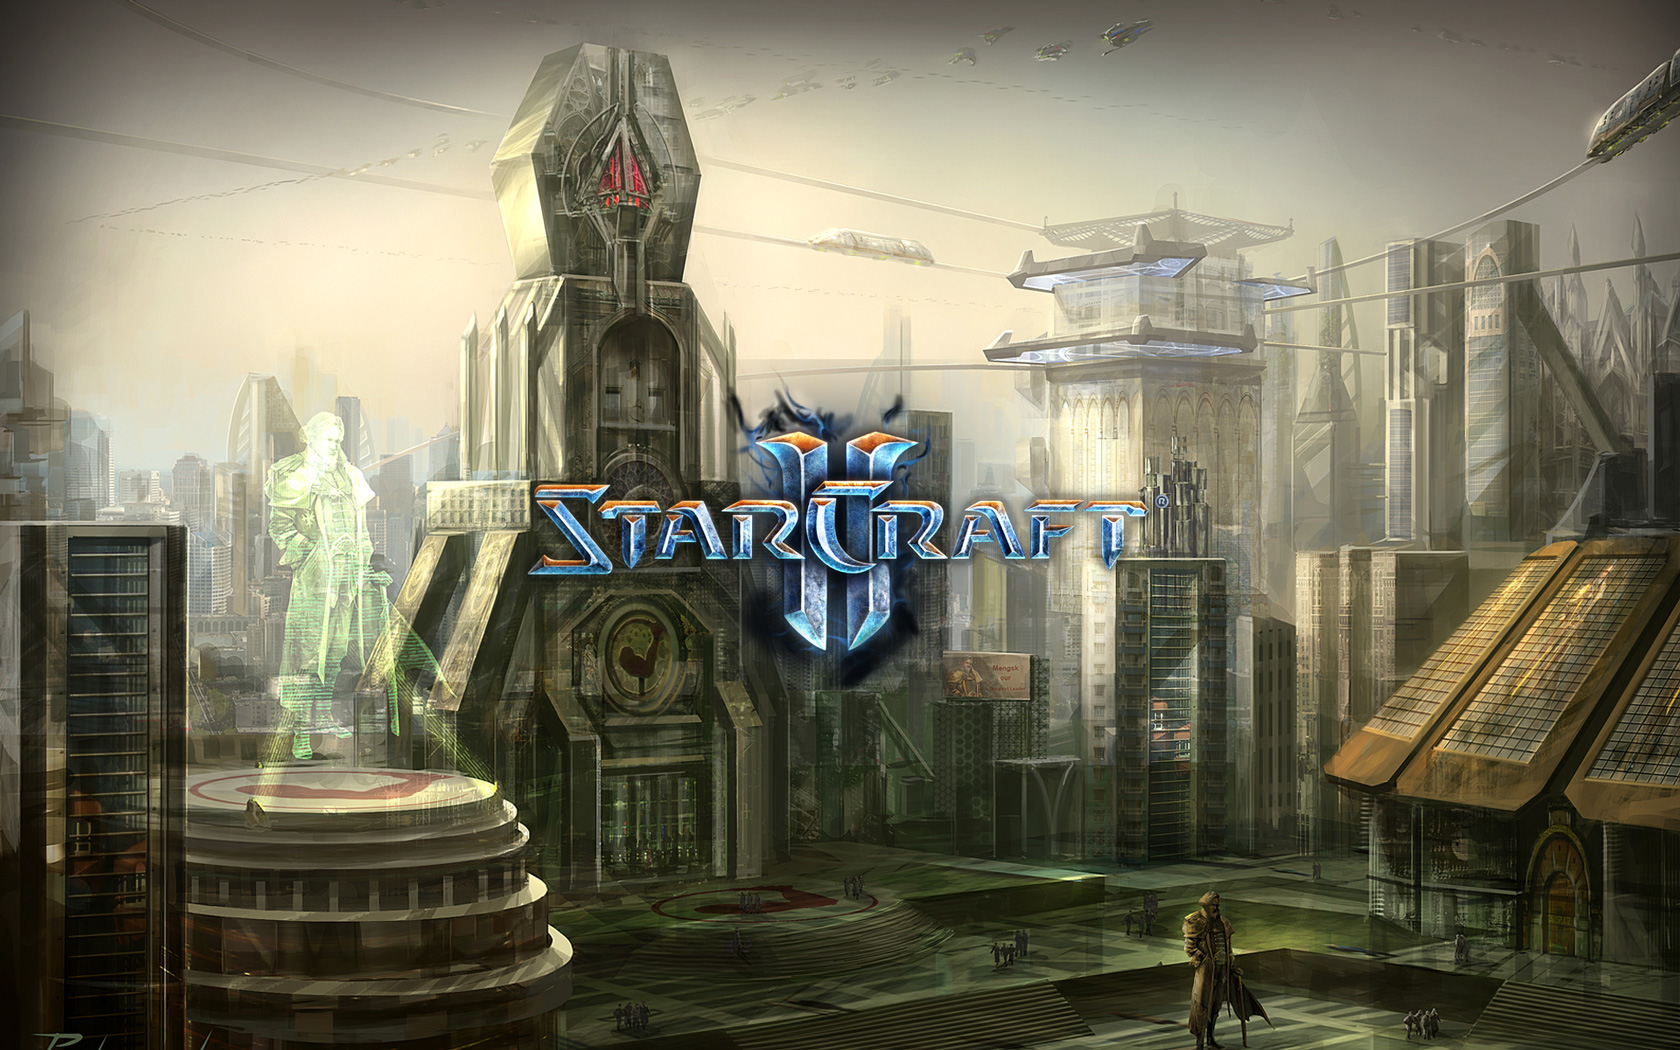 Free Starcraft 2 Wallpaper in 1680x1050